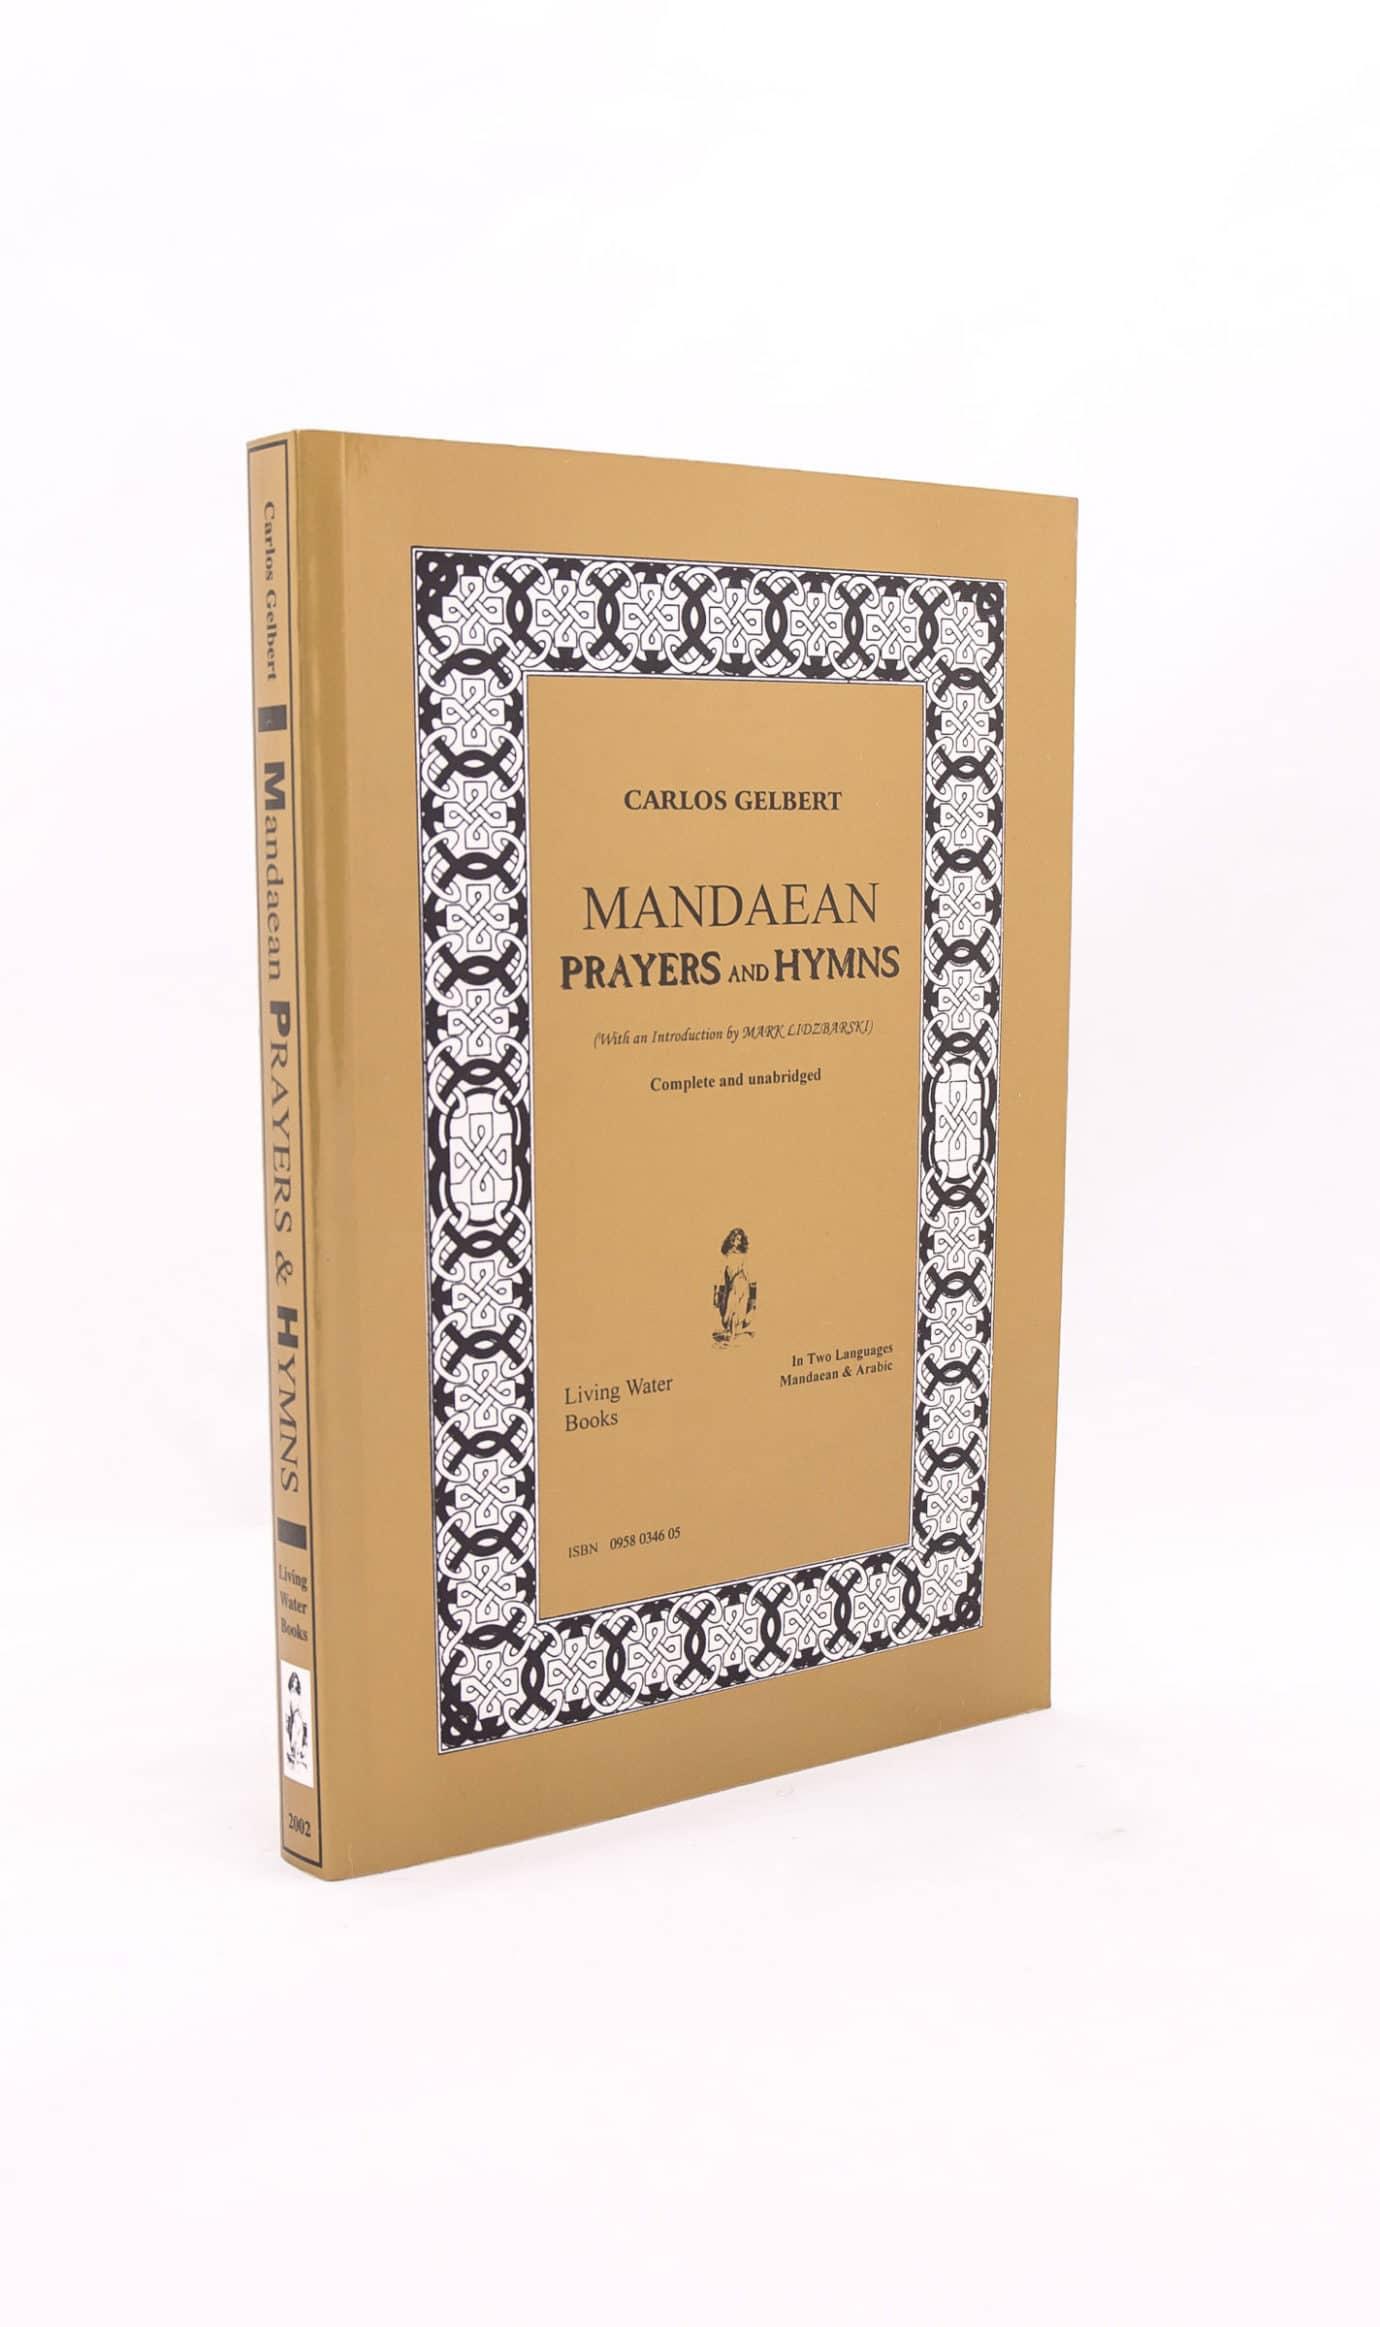 Mandaean Prayers and Hymns